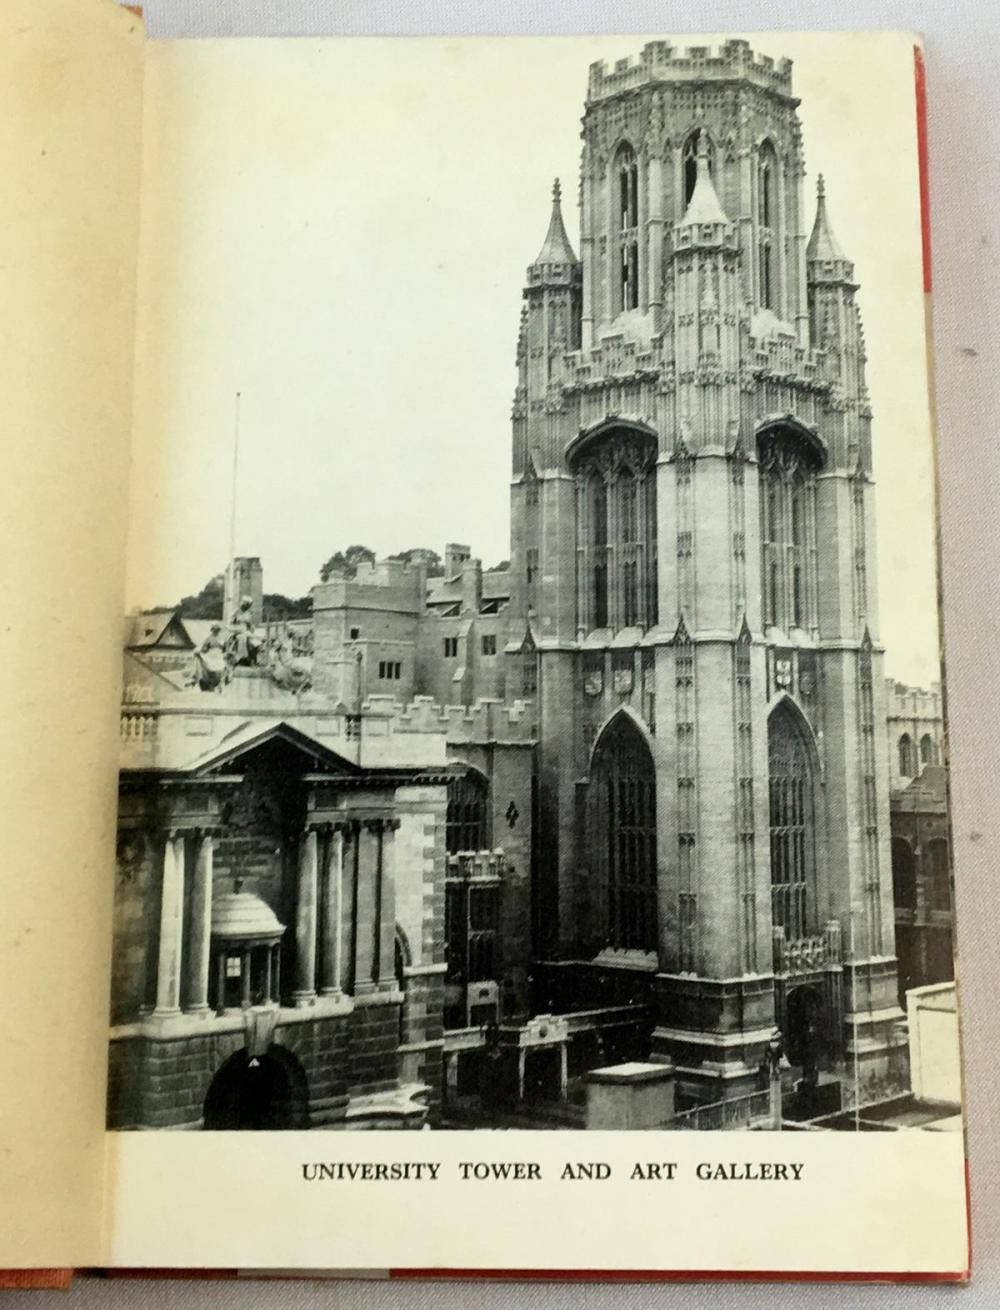 1946 Bristol England by Harold G. Brown w/ Dust Jacket FIRST EDITION Ruth E. Gutfrucht Artist Copy